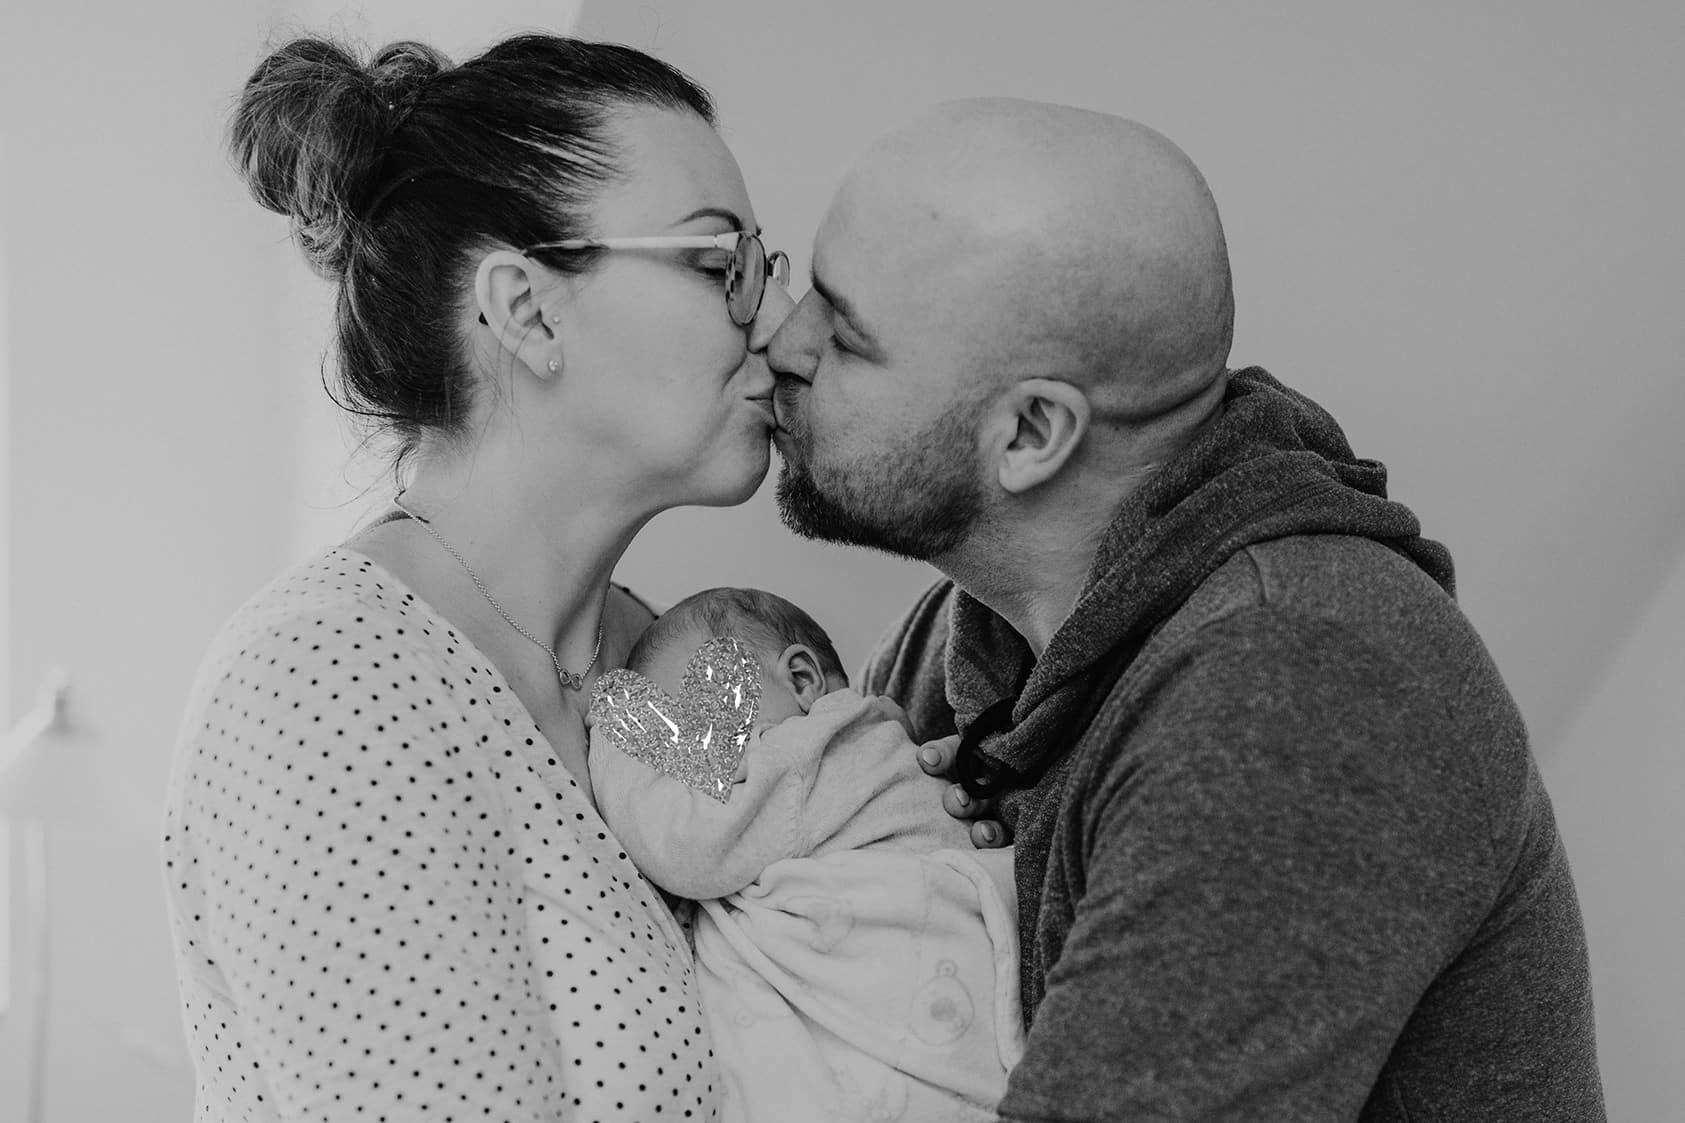 Babyshooting-Familienshooting-Familienfotografie-hundefotografie-reinheim-mainz-wiesbaden-darmstadt-fotograf-hochzeitsfotograf-homestory22